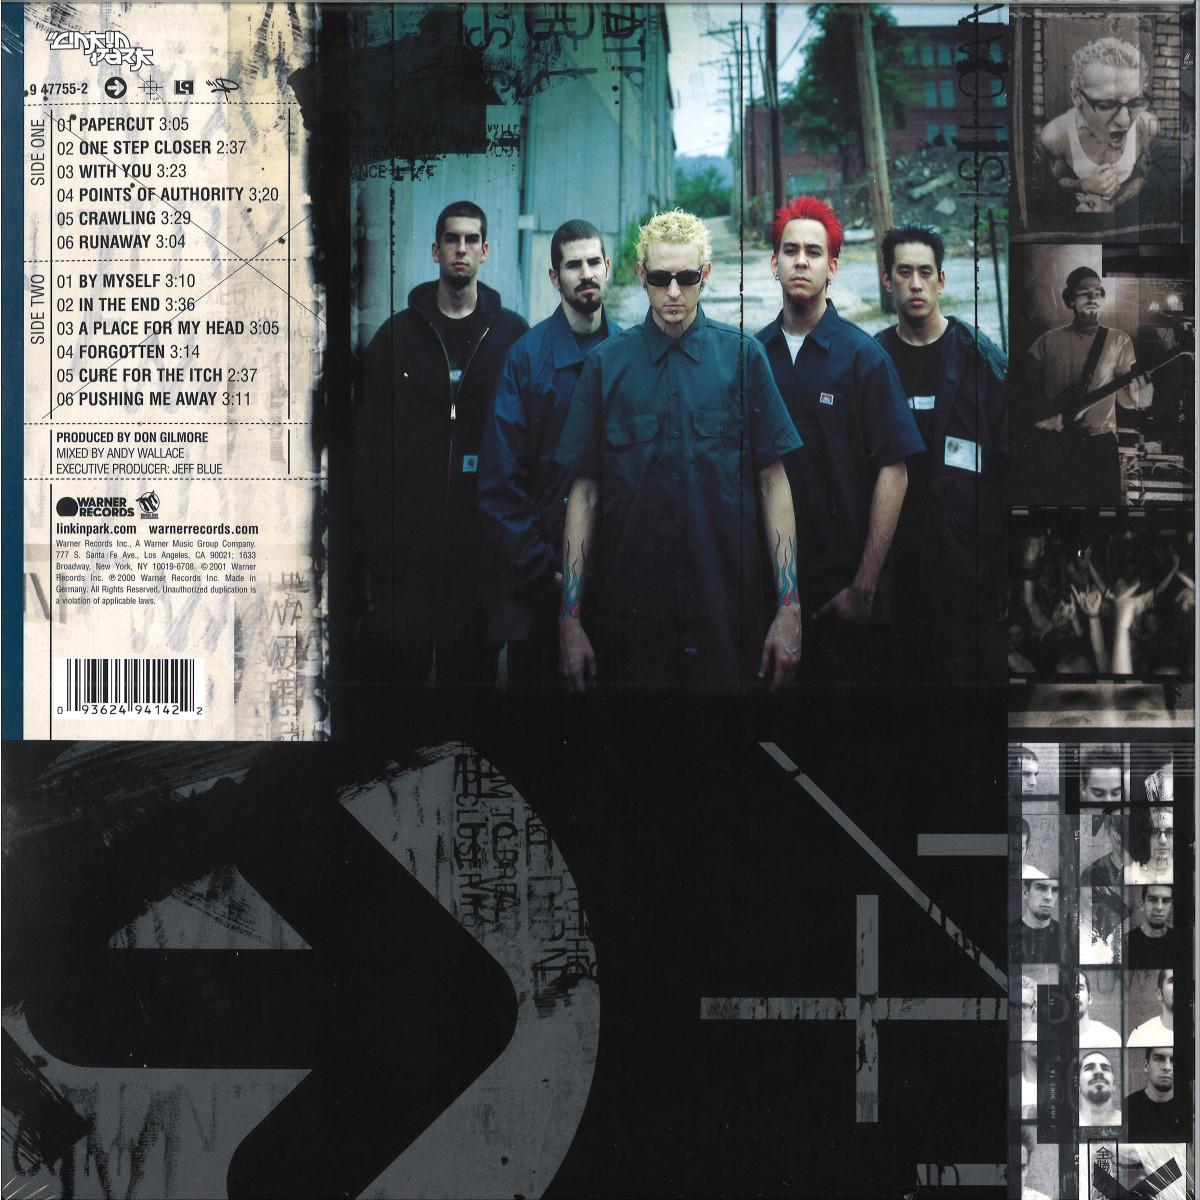 Linkin Park - Hybrid Theory / Rhino 9362494142 - Vinyl